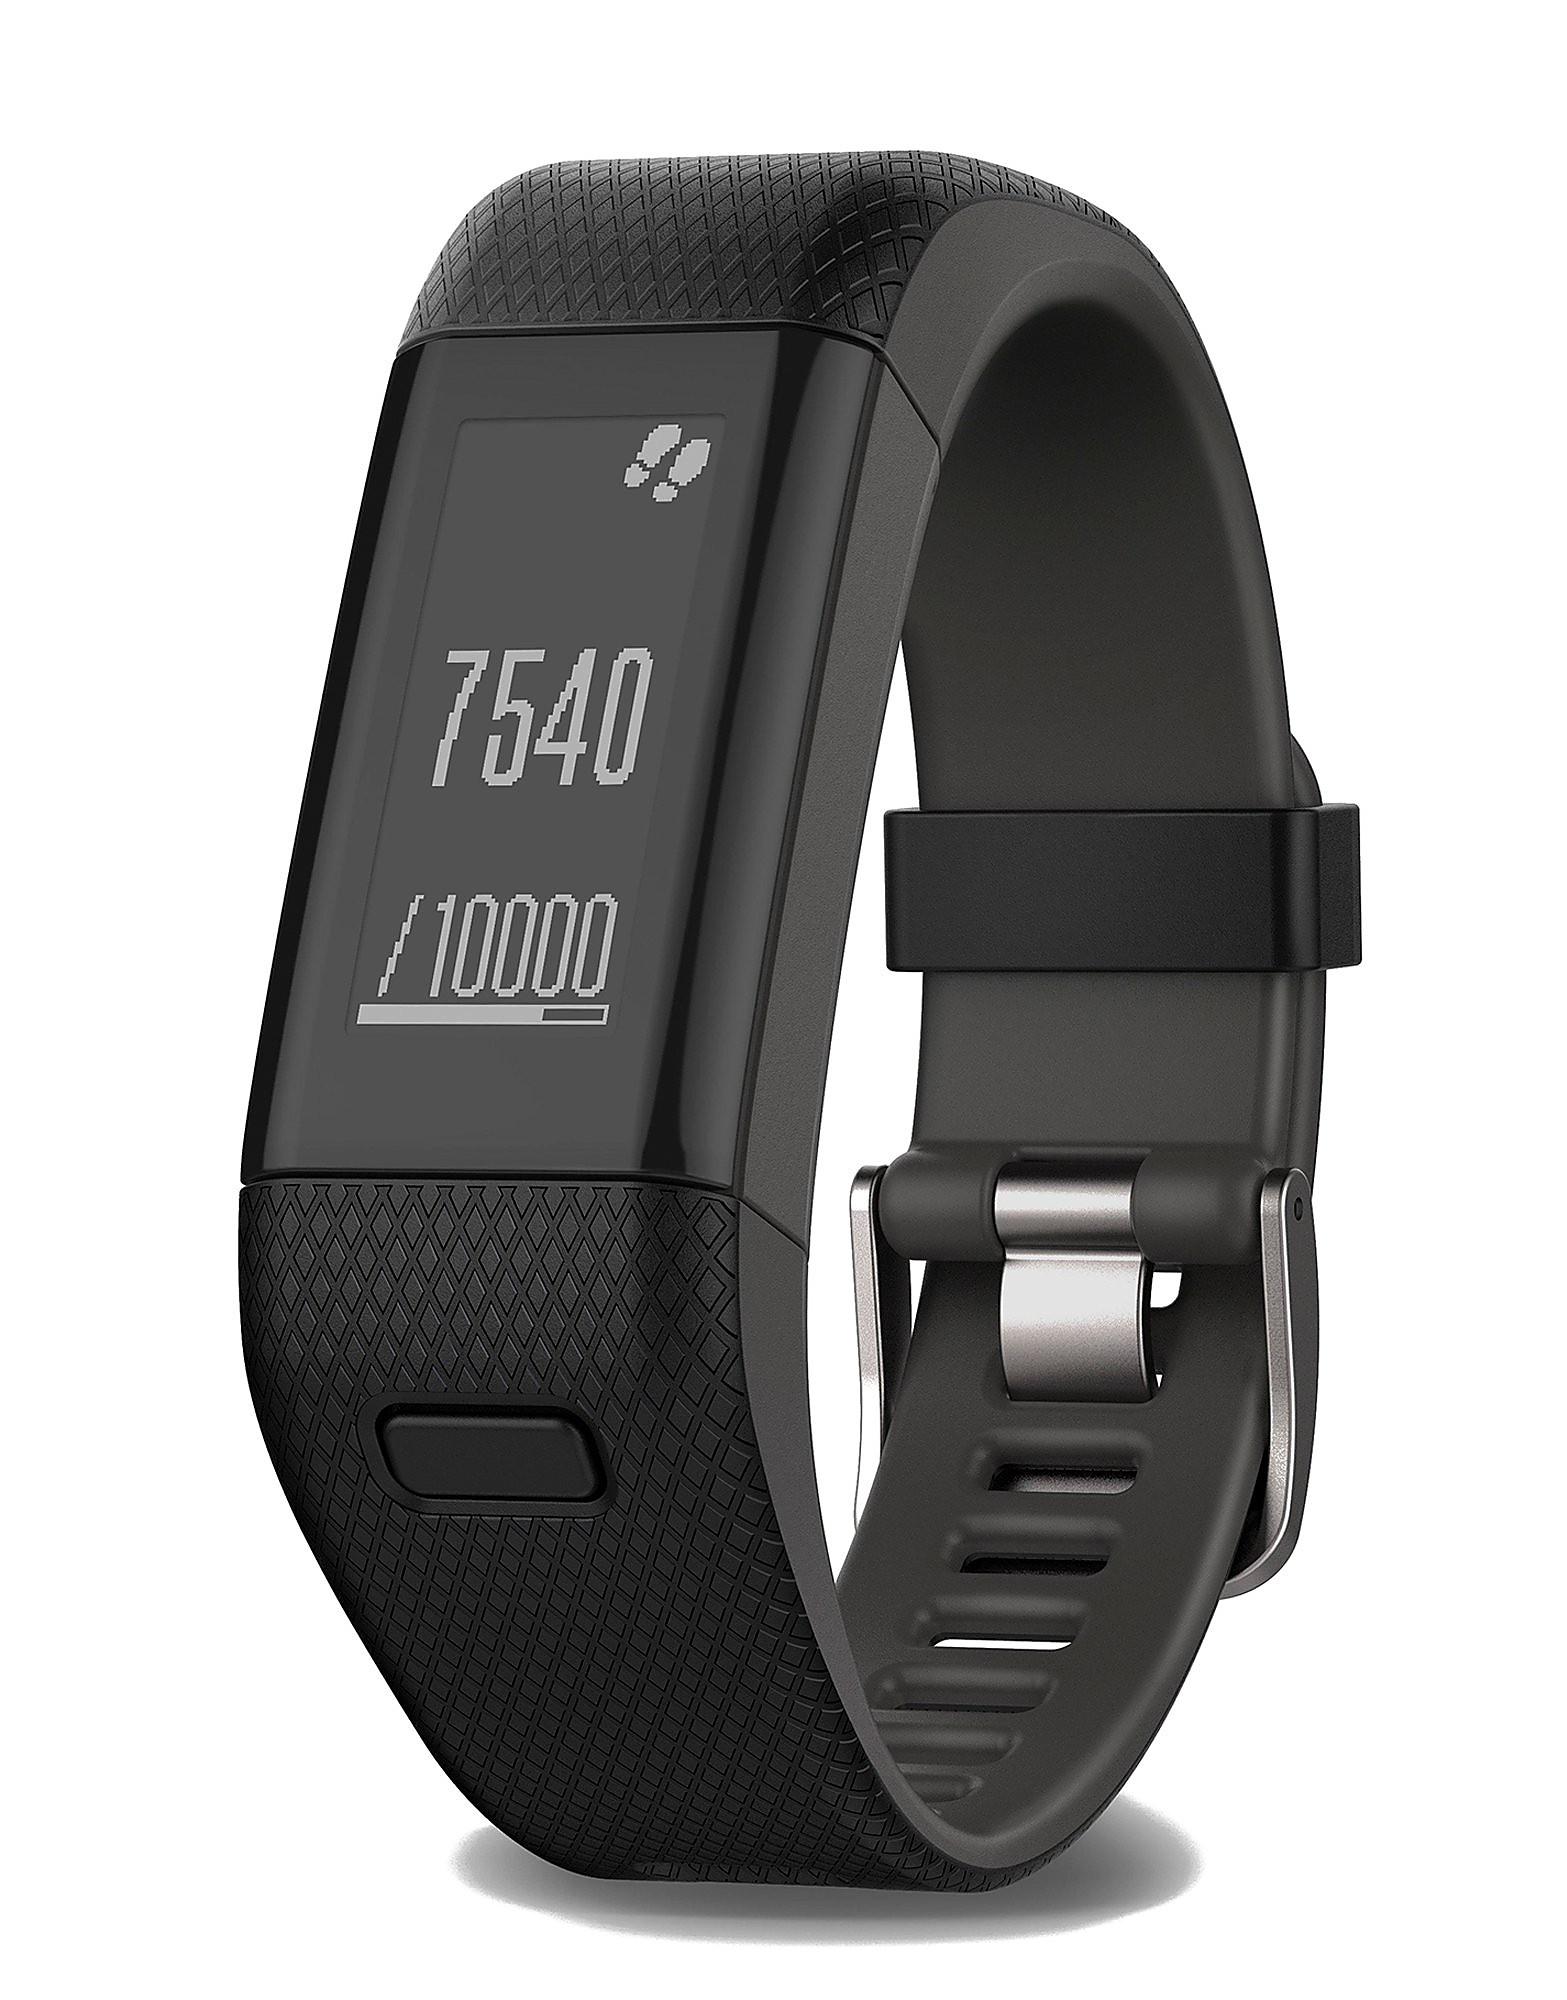 Garmin vivosmart HR+ GPS Activity Tracker (L Wristband)